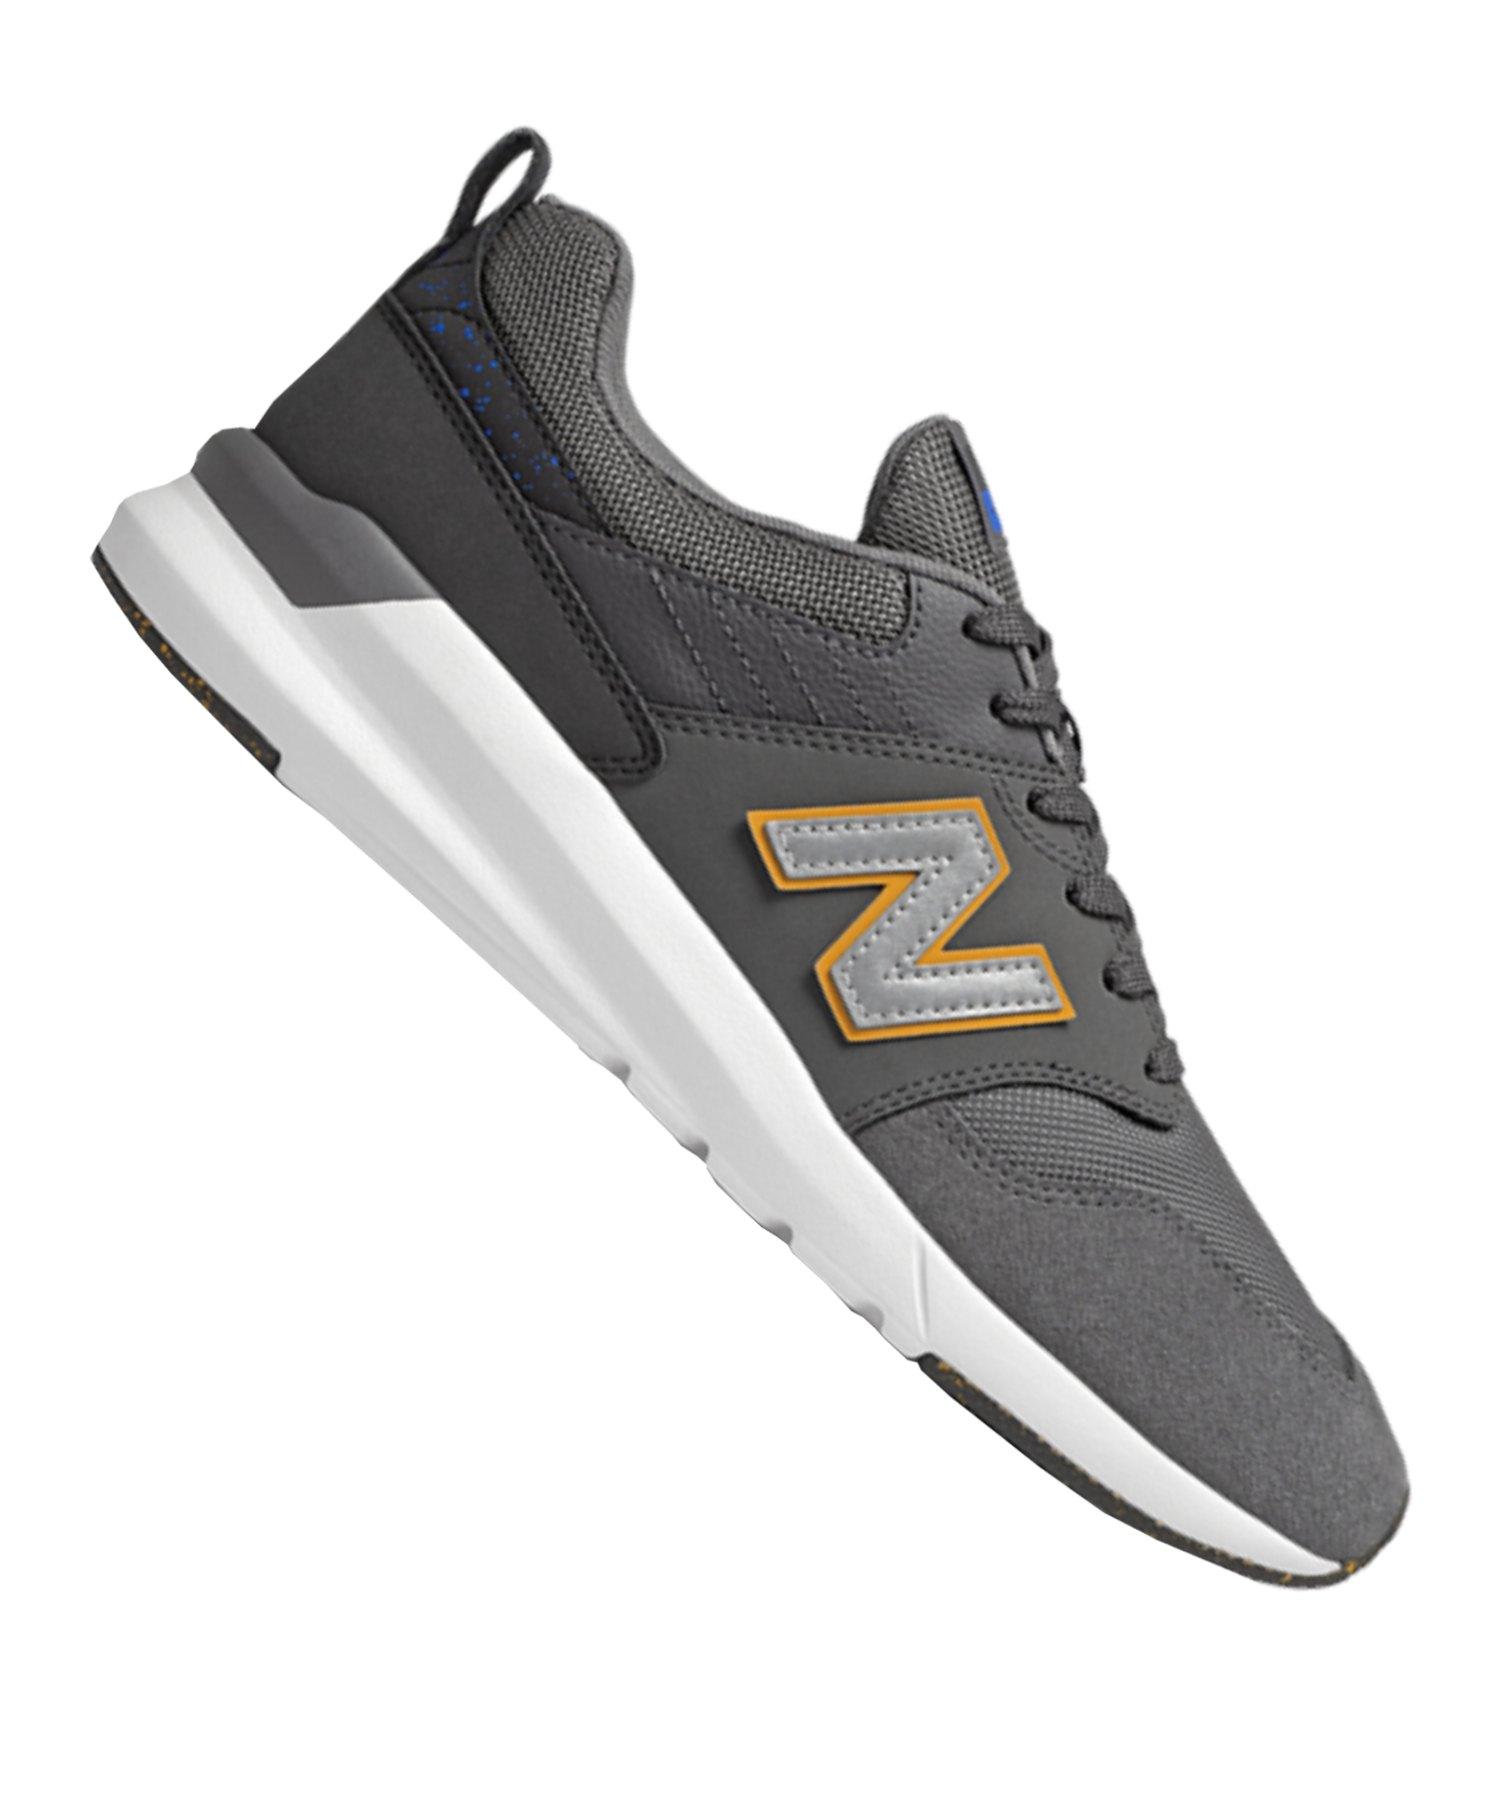 New Balance MS009 D Sneaker Grau F12 - grau